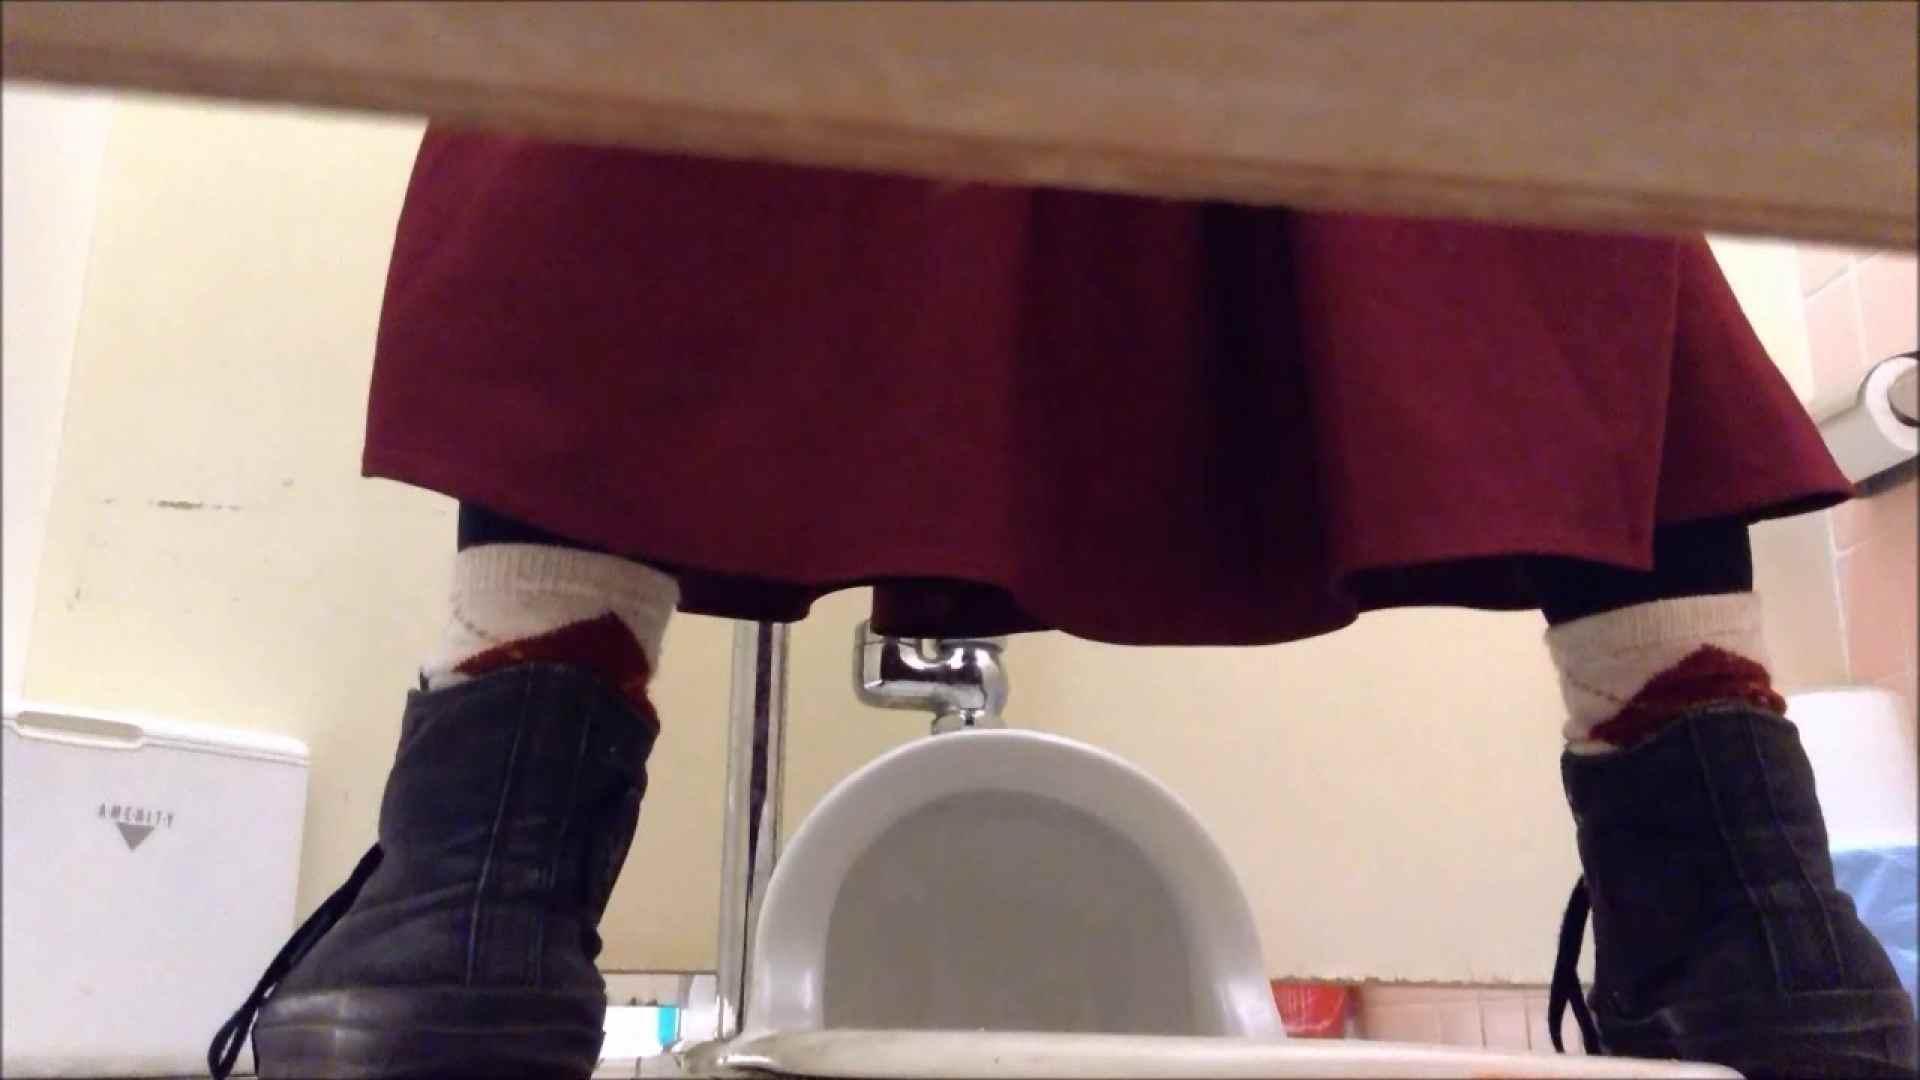 某有名大学女性洗面所 vol.09 OLのボディ 戯れ無修正画像 78PIX 27